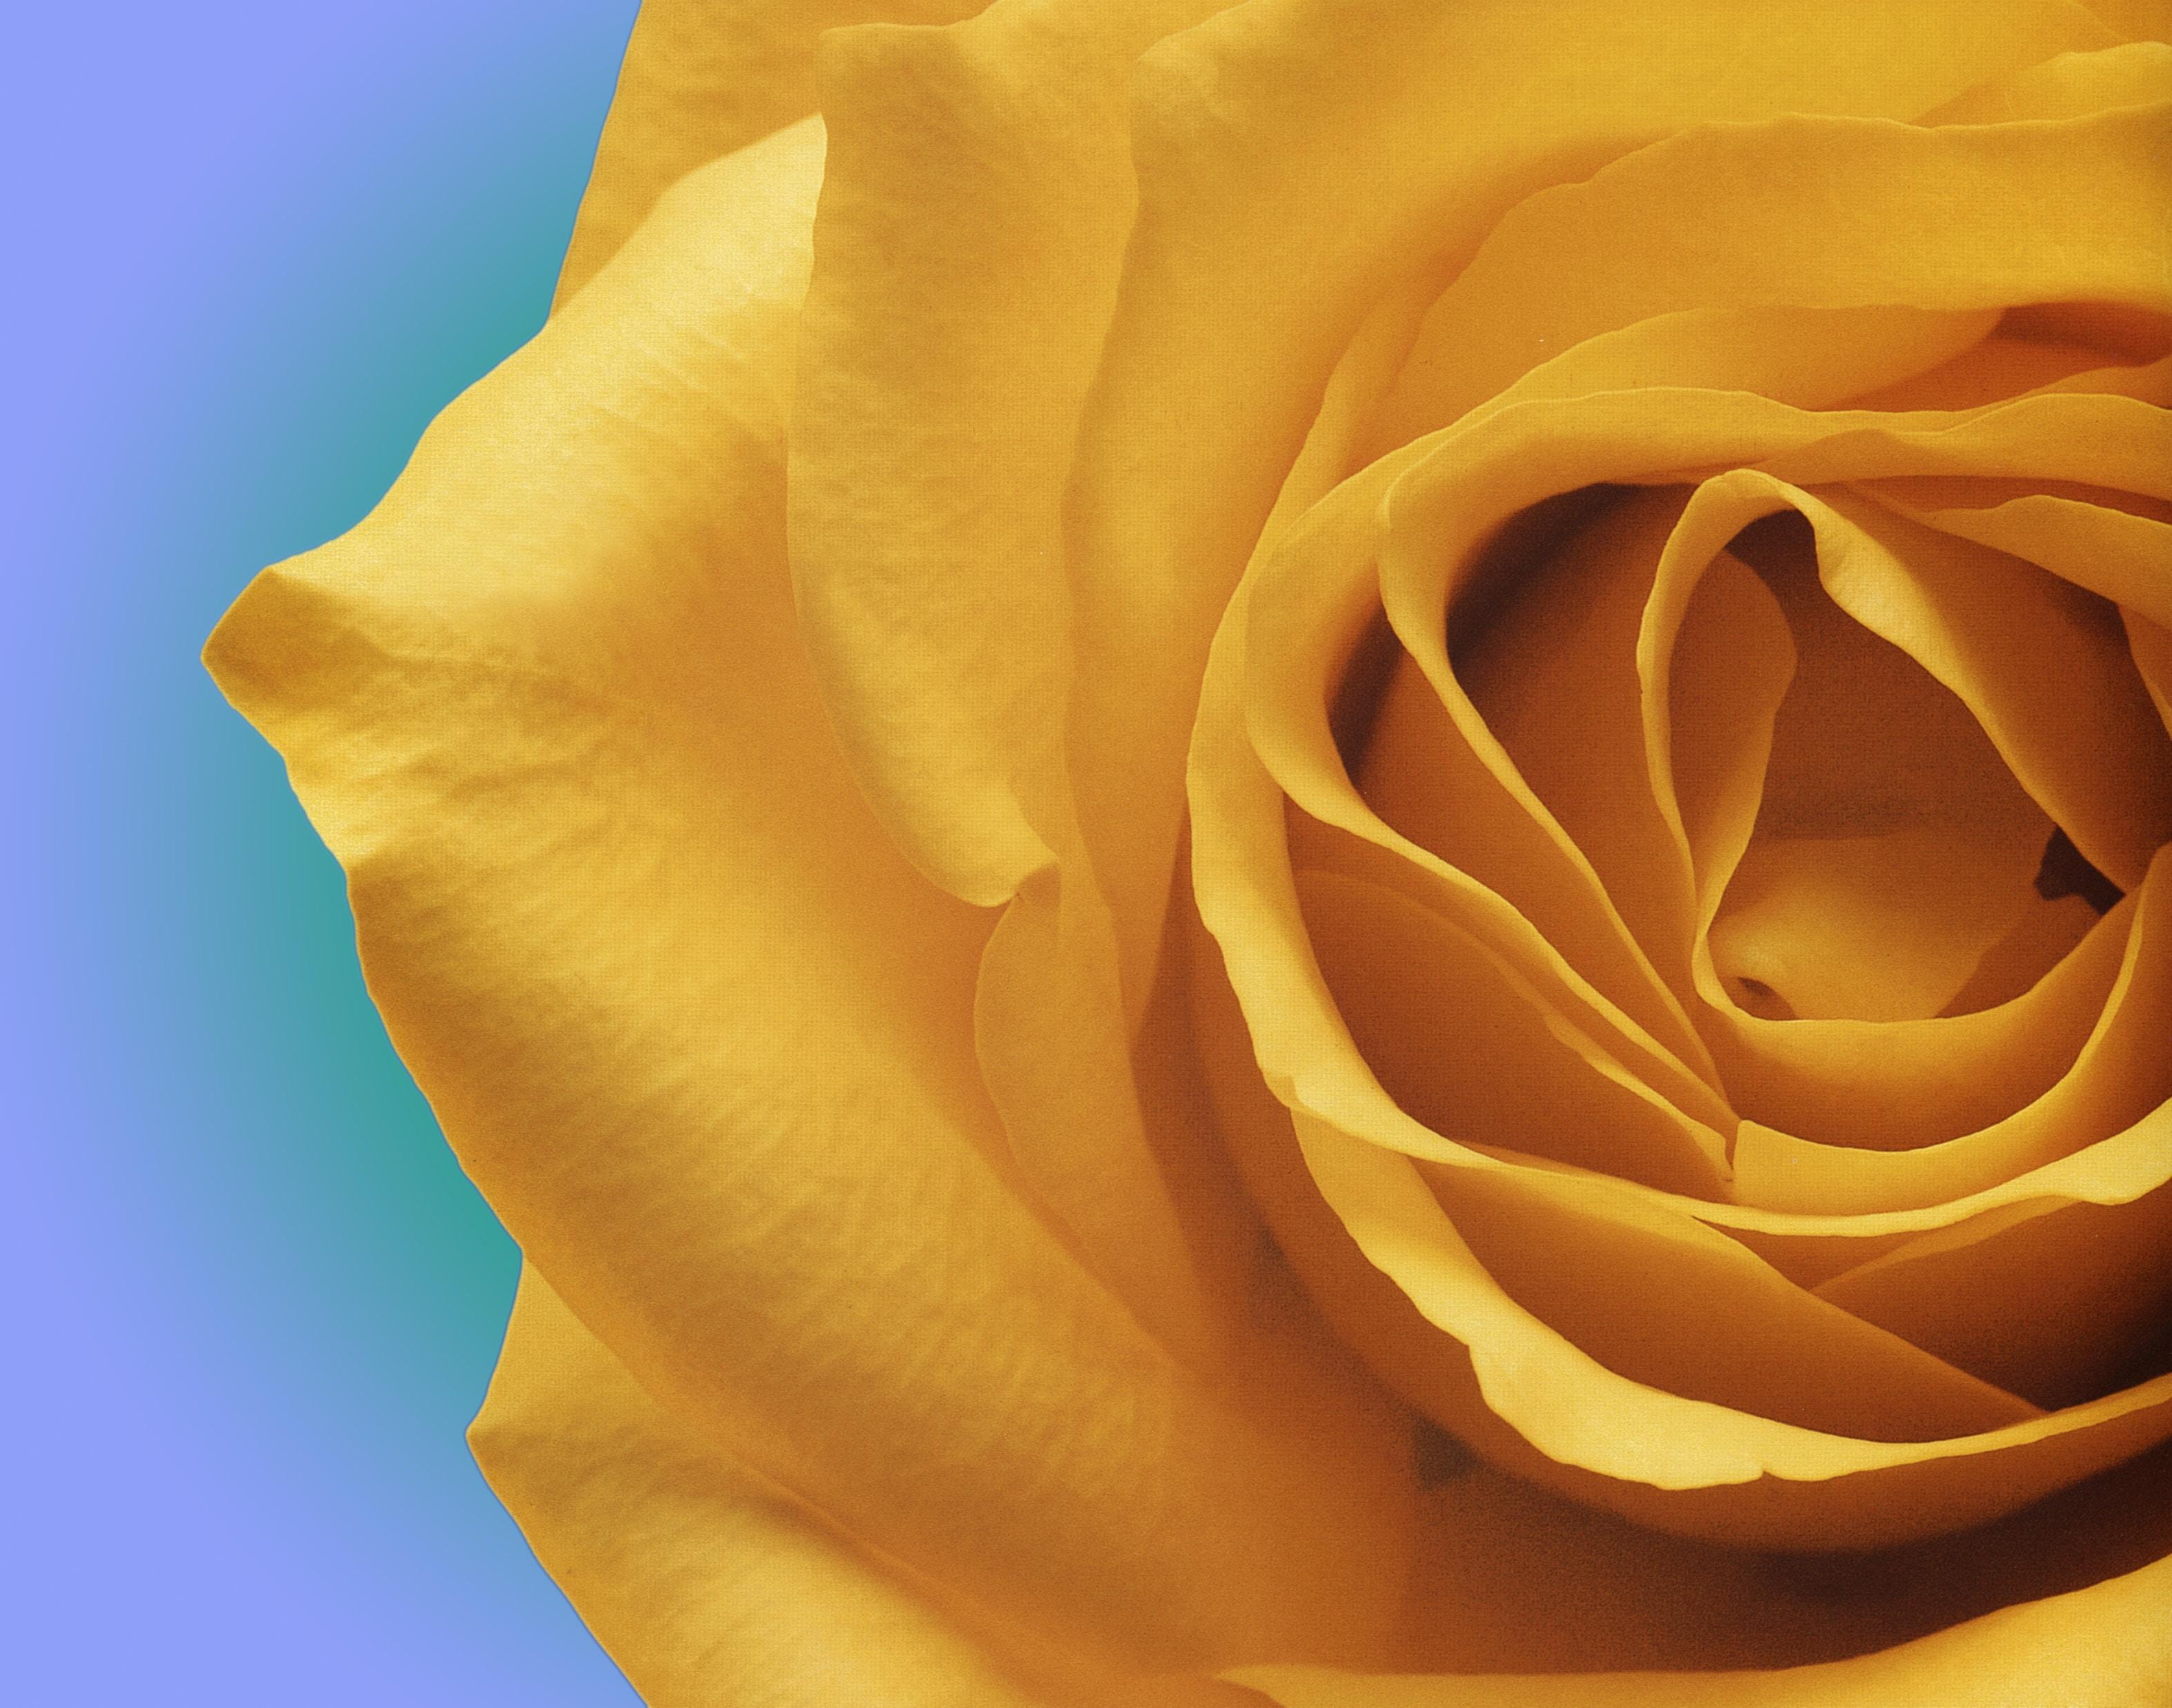 closeup photo of yellow rose flower